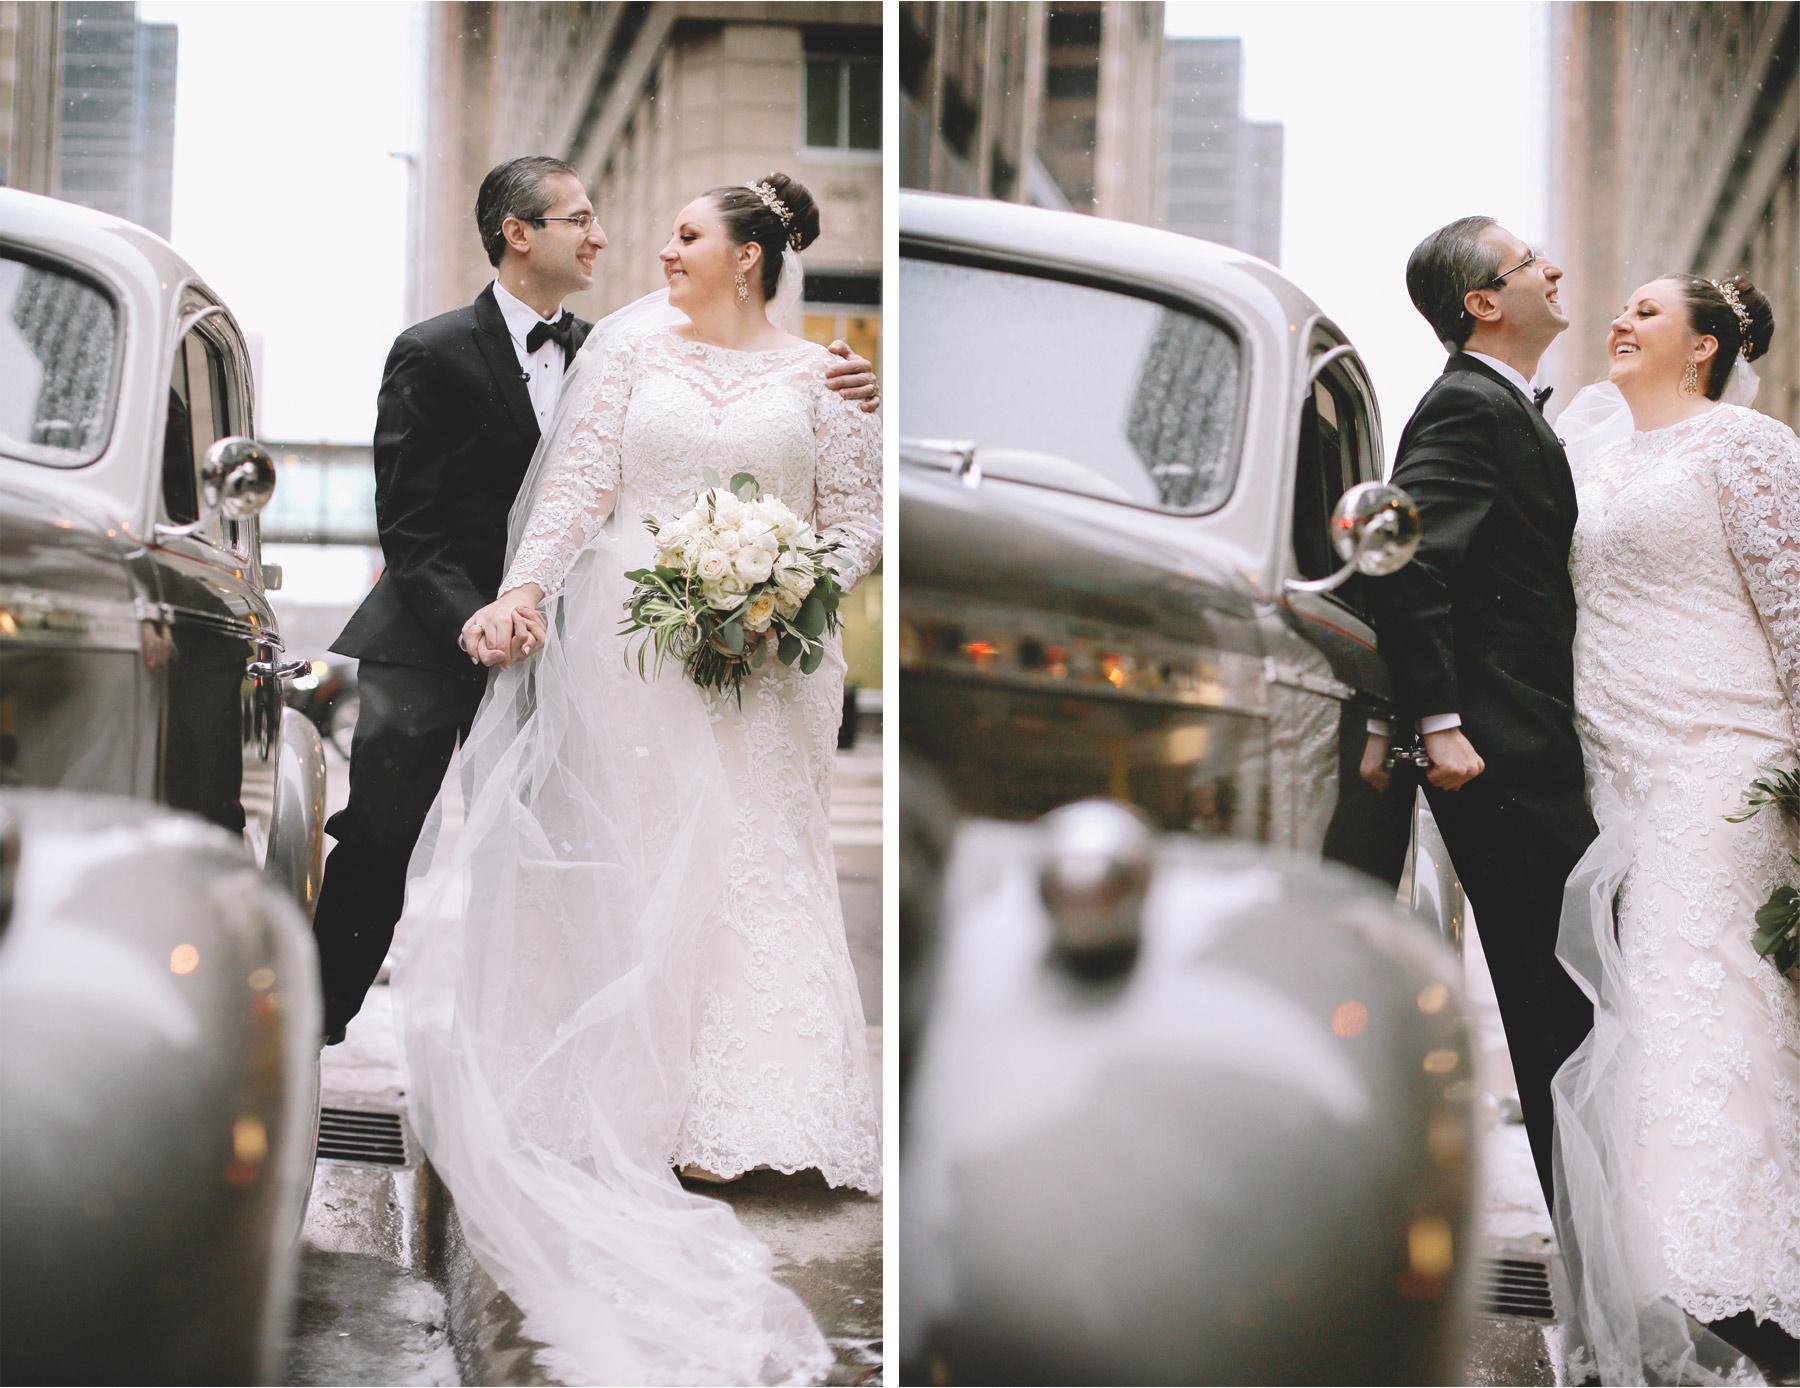 12-Minneapolis-Minnesota-Wedding-Photography-by-Vick-Photography-Classic-Car-Downtown-Anja-and-Waseem.jpg